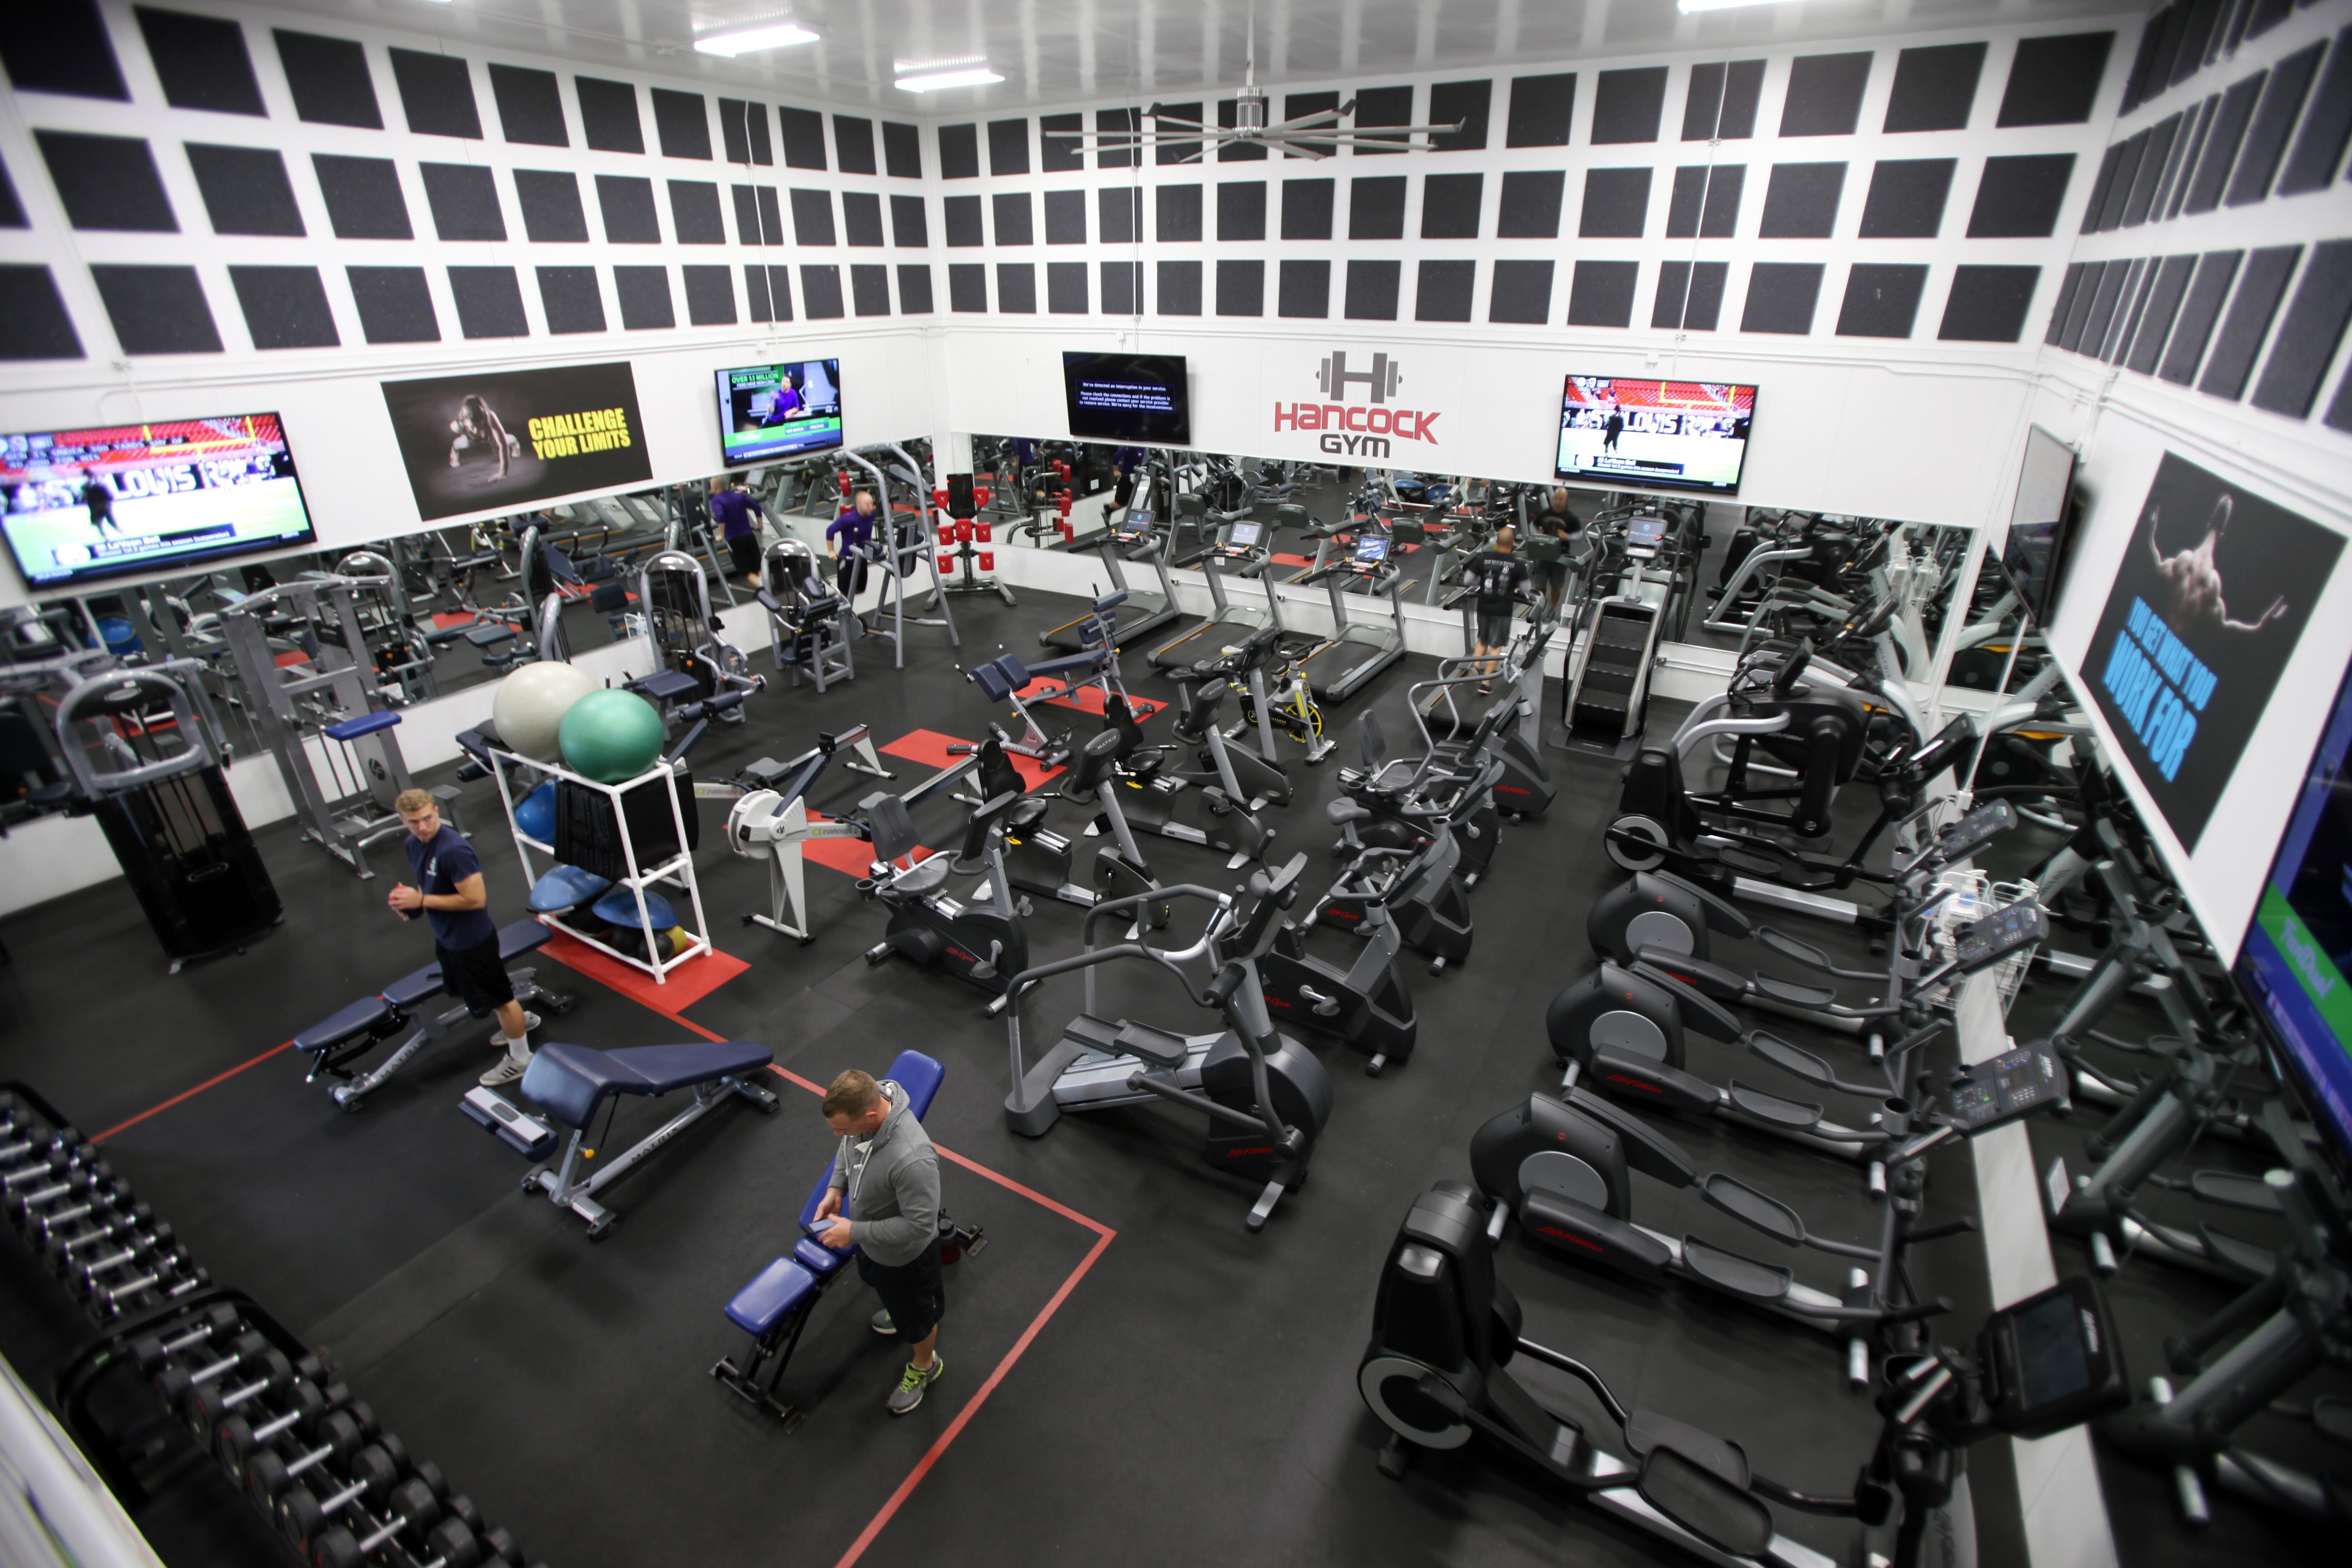 devil dog gym